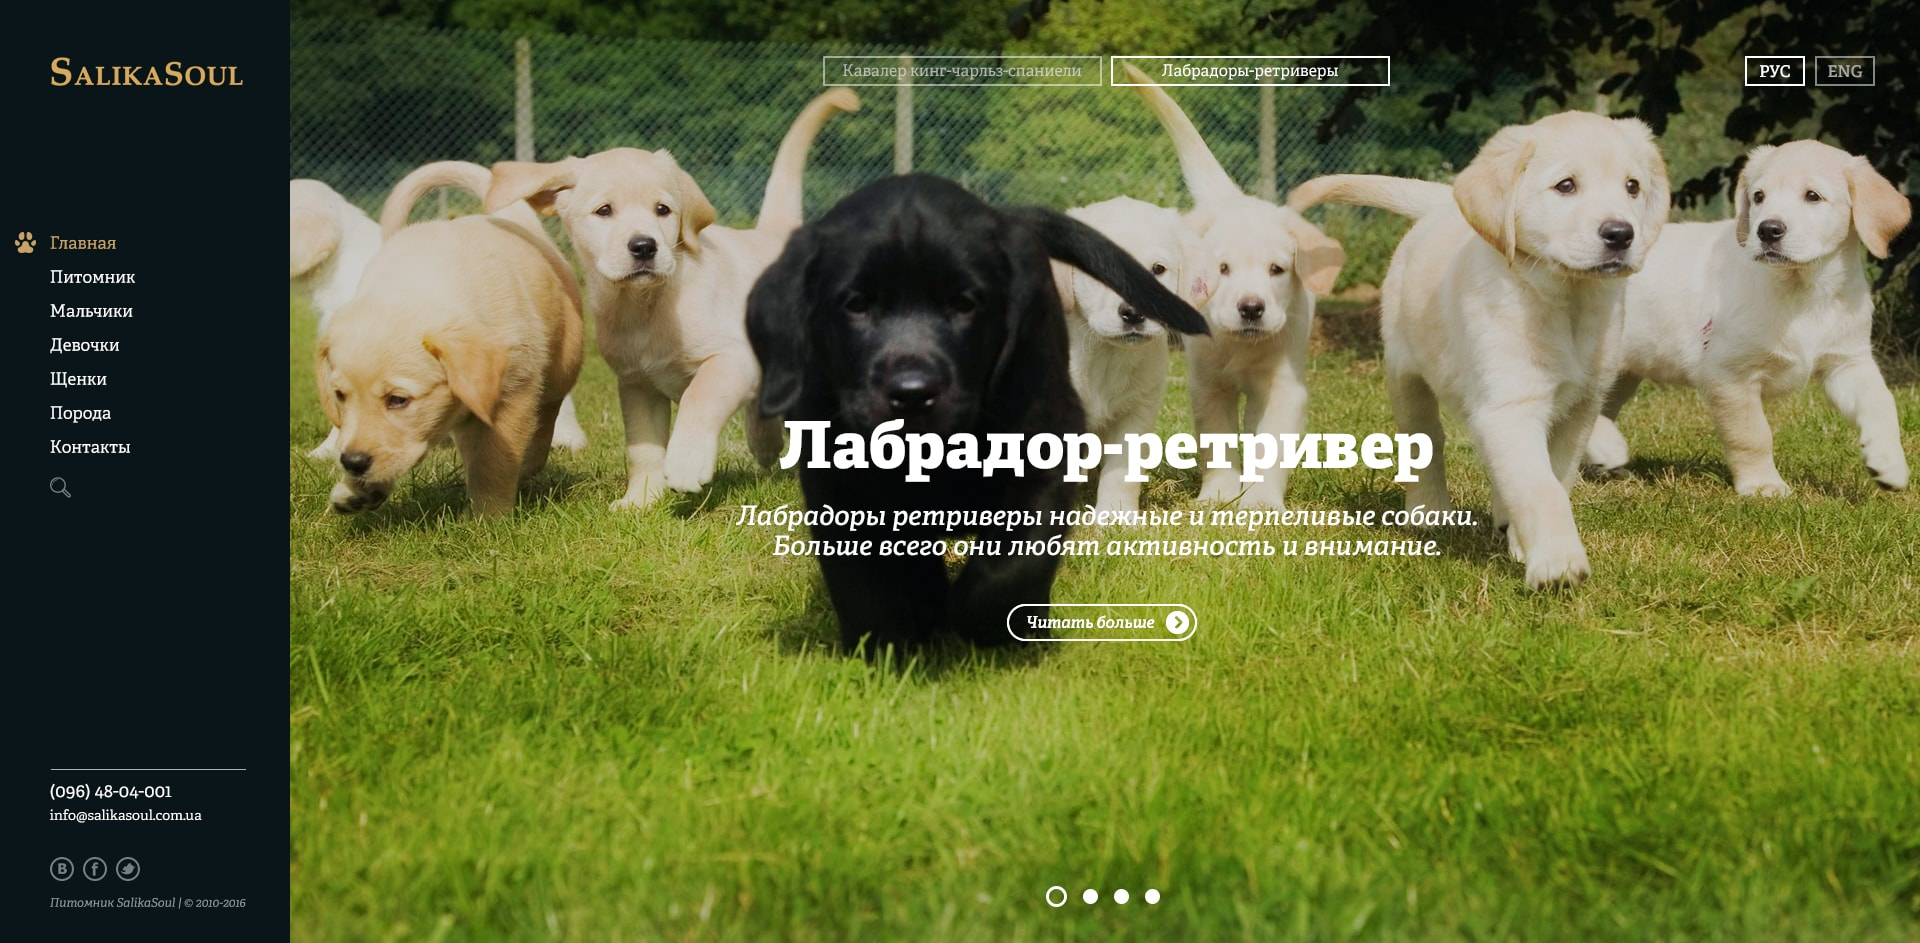 https://vladimir-alexandrov.com/wp-content/uploads/2017/10/SalikaSoul_0-min.jpg